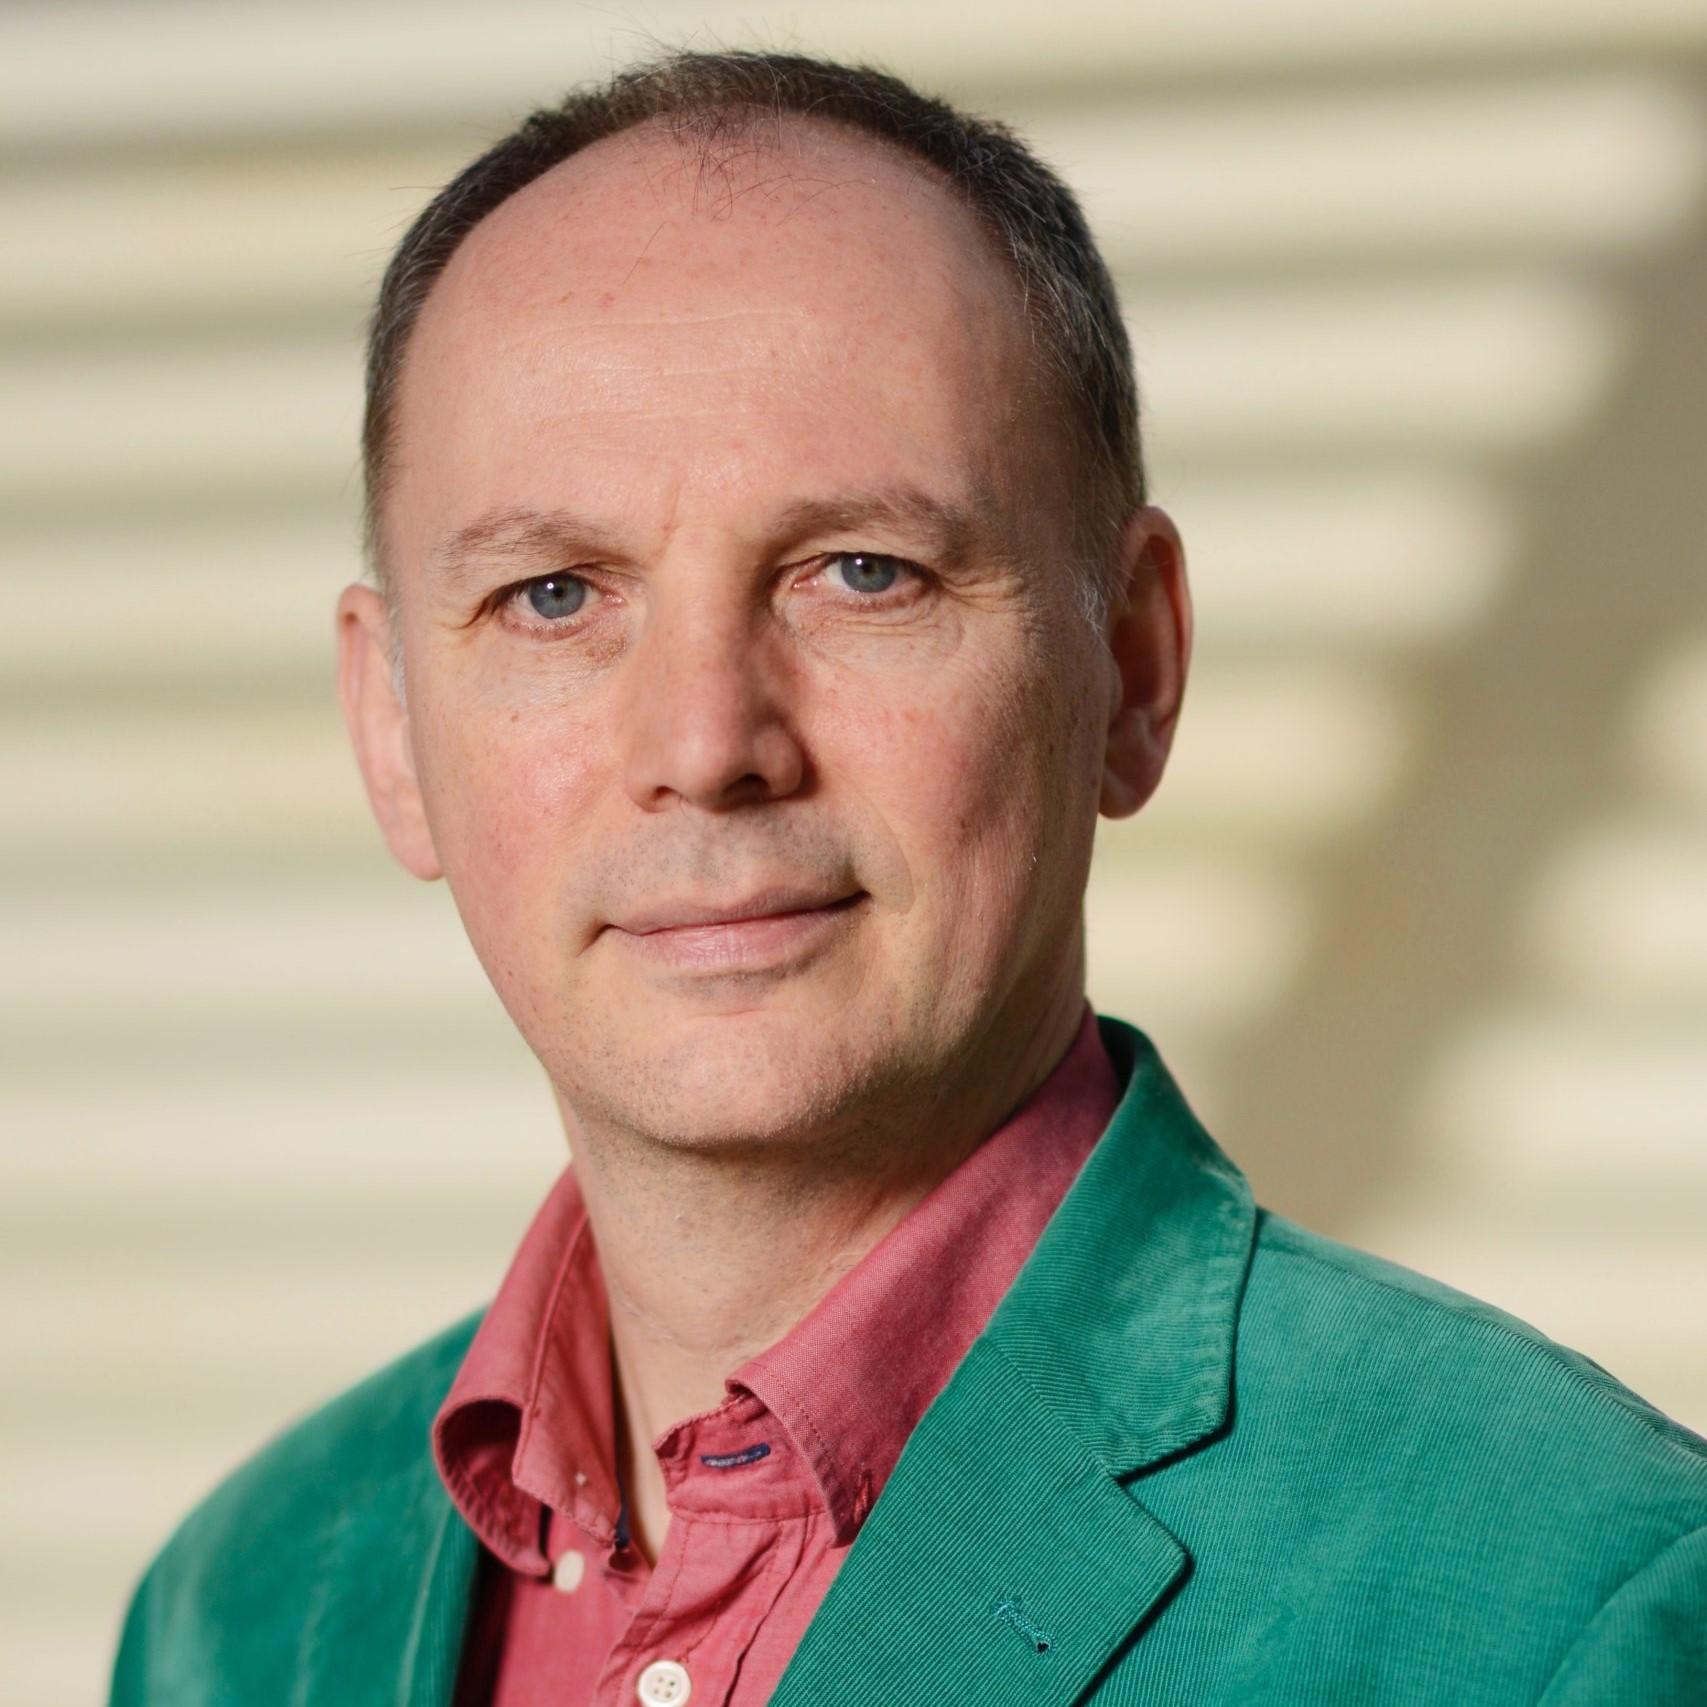 Dr. Wolfgang Strengmann Kuhn MdB